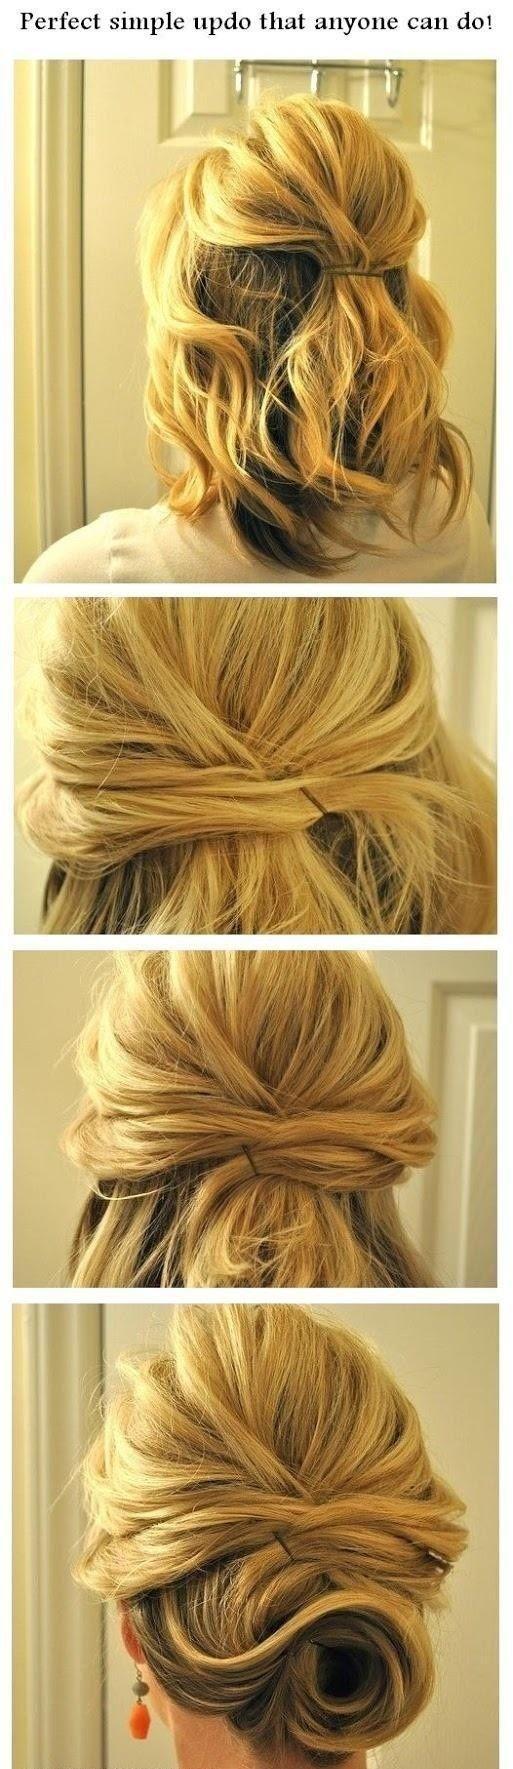 Brilliant 15 Cute Easy Hairstyle Tutorials For Medium Length Hair Gurl Com Short Hairstyles For Black Women Fulllsitofus